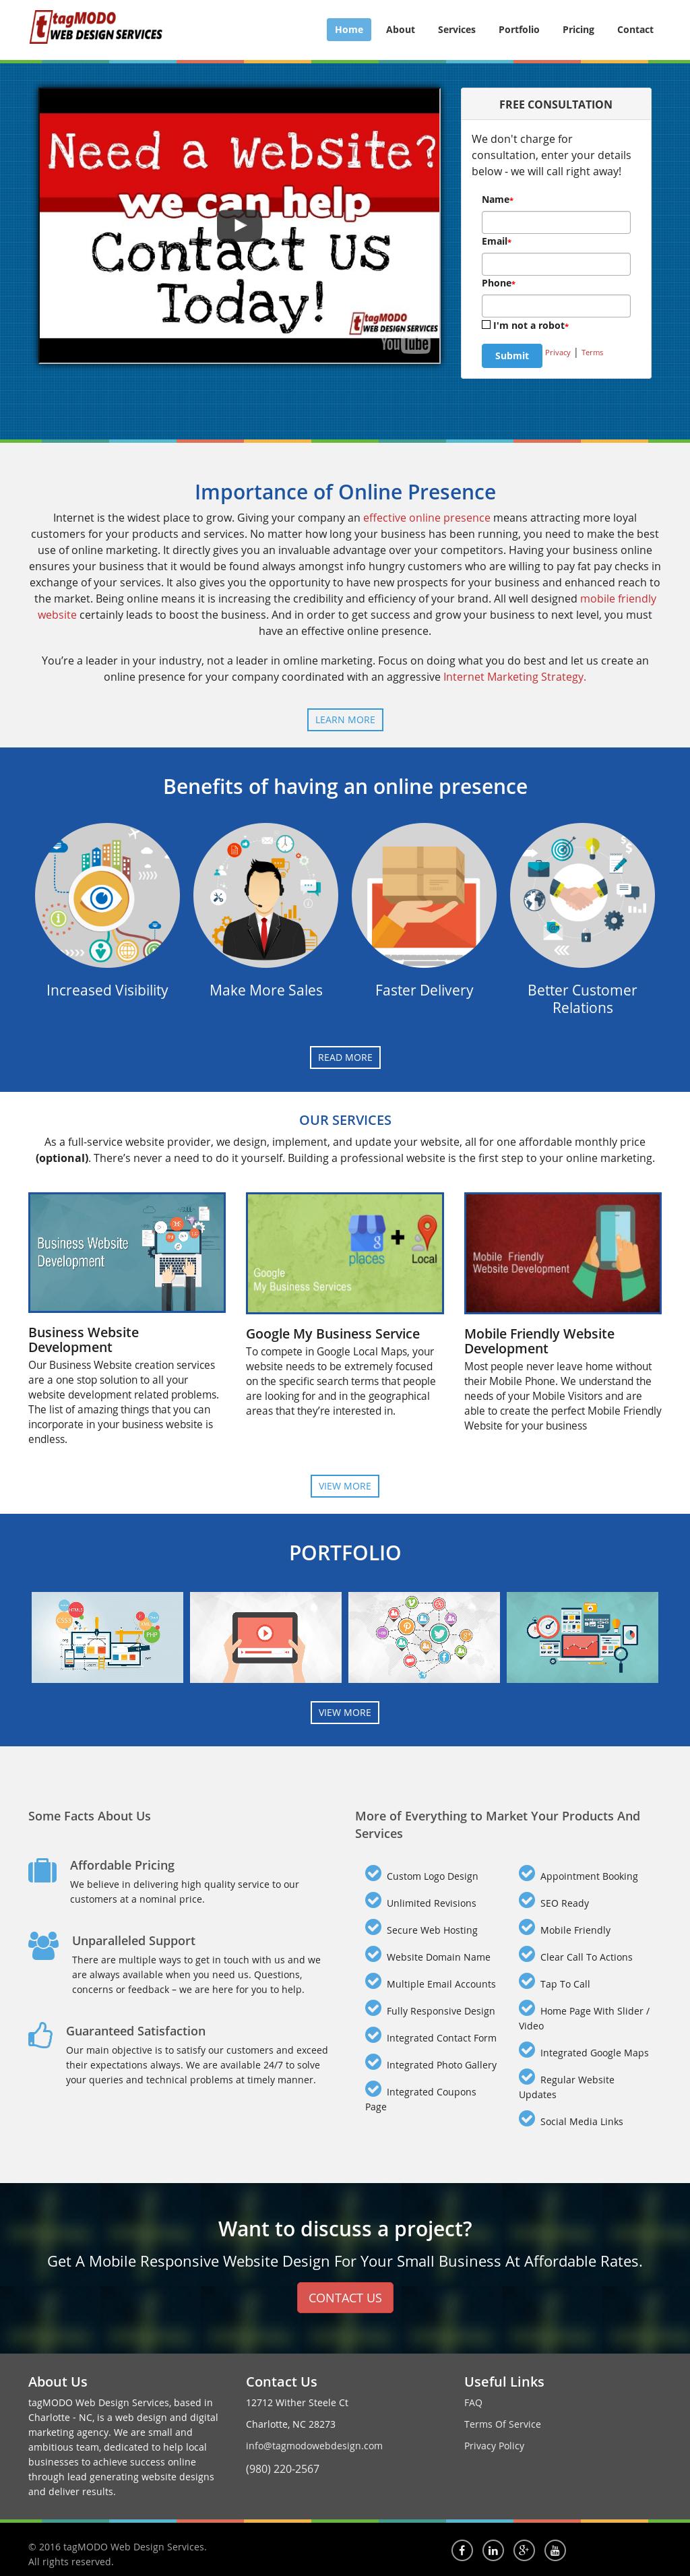 Tagmodo Web Design Services Competitors, Revenue and Employees